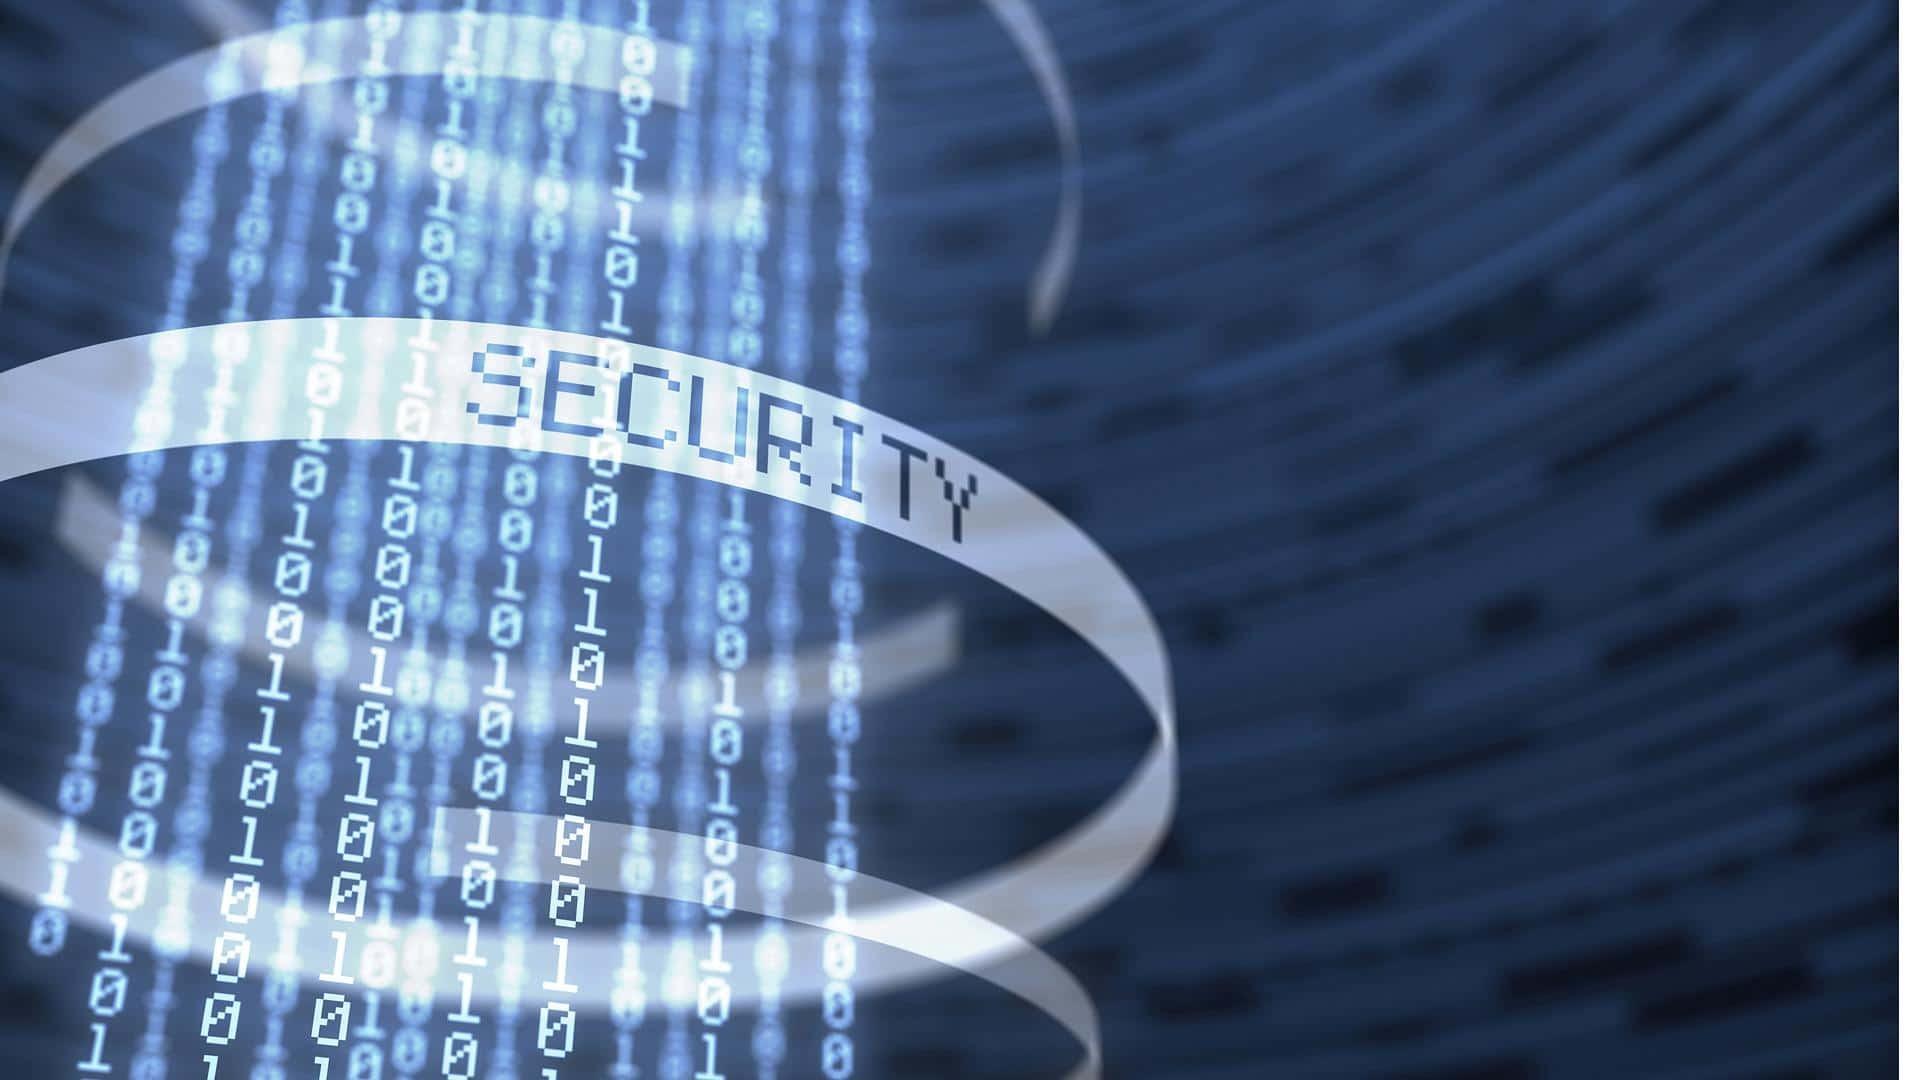 Y-nghia-Security-la-gi